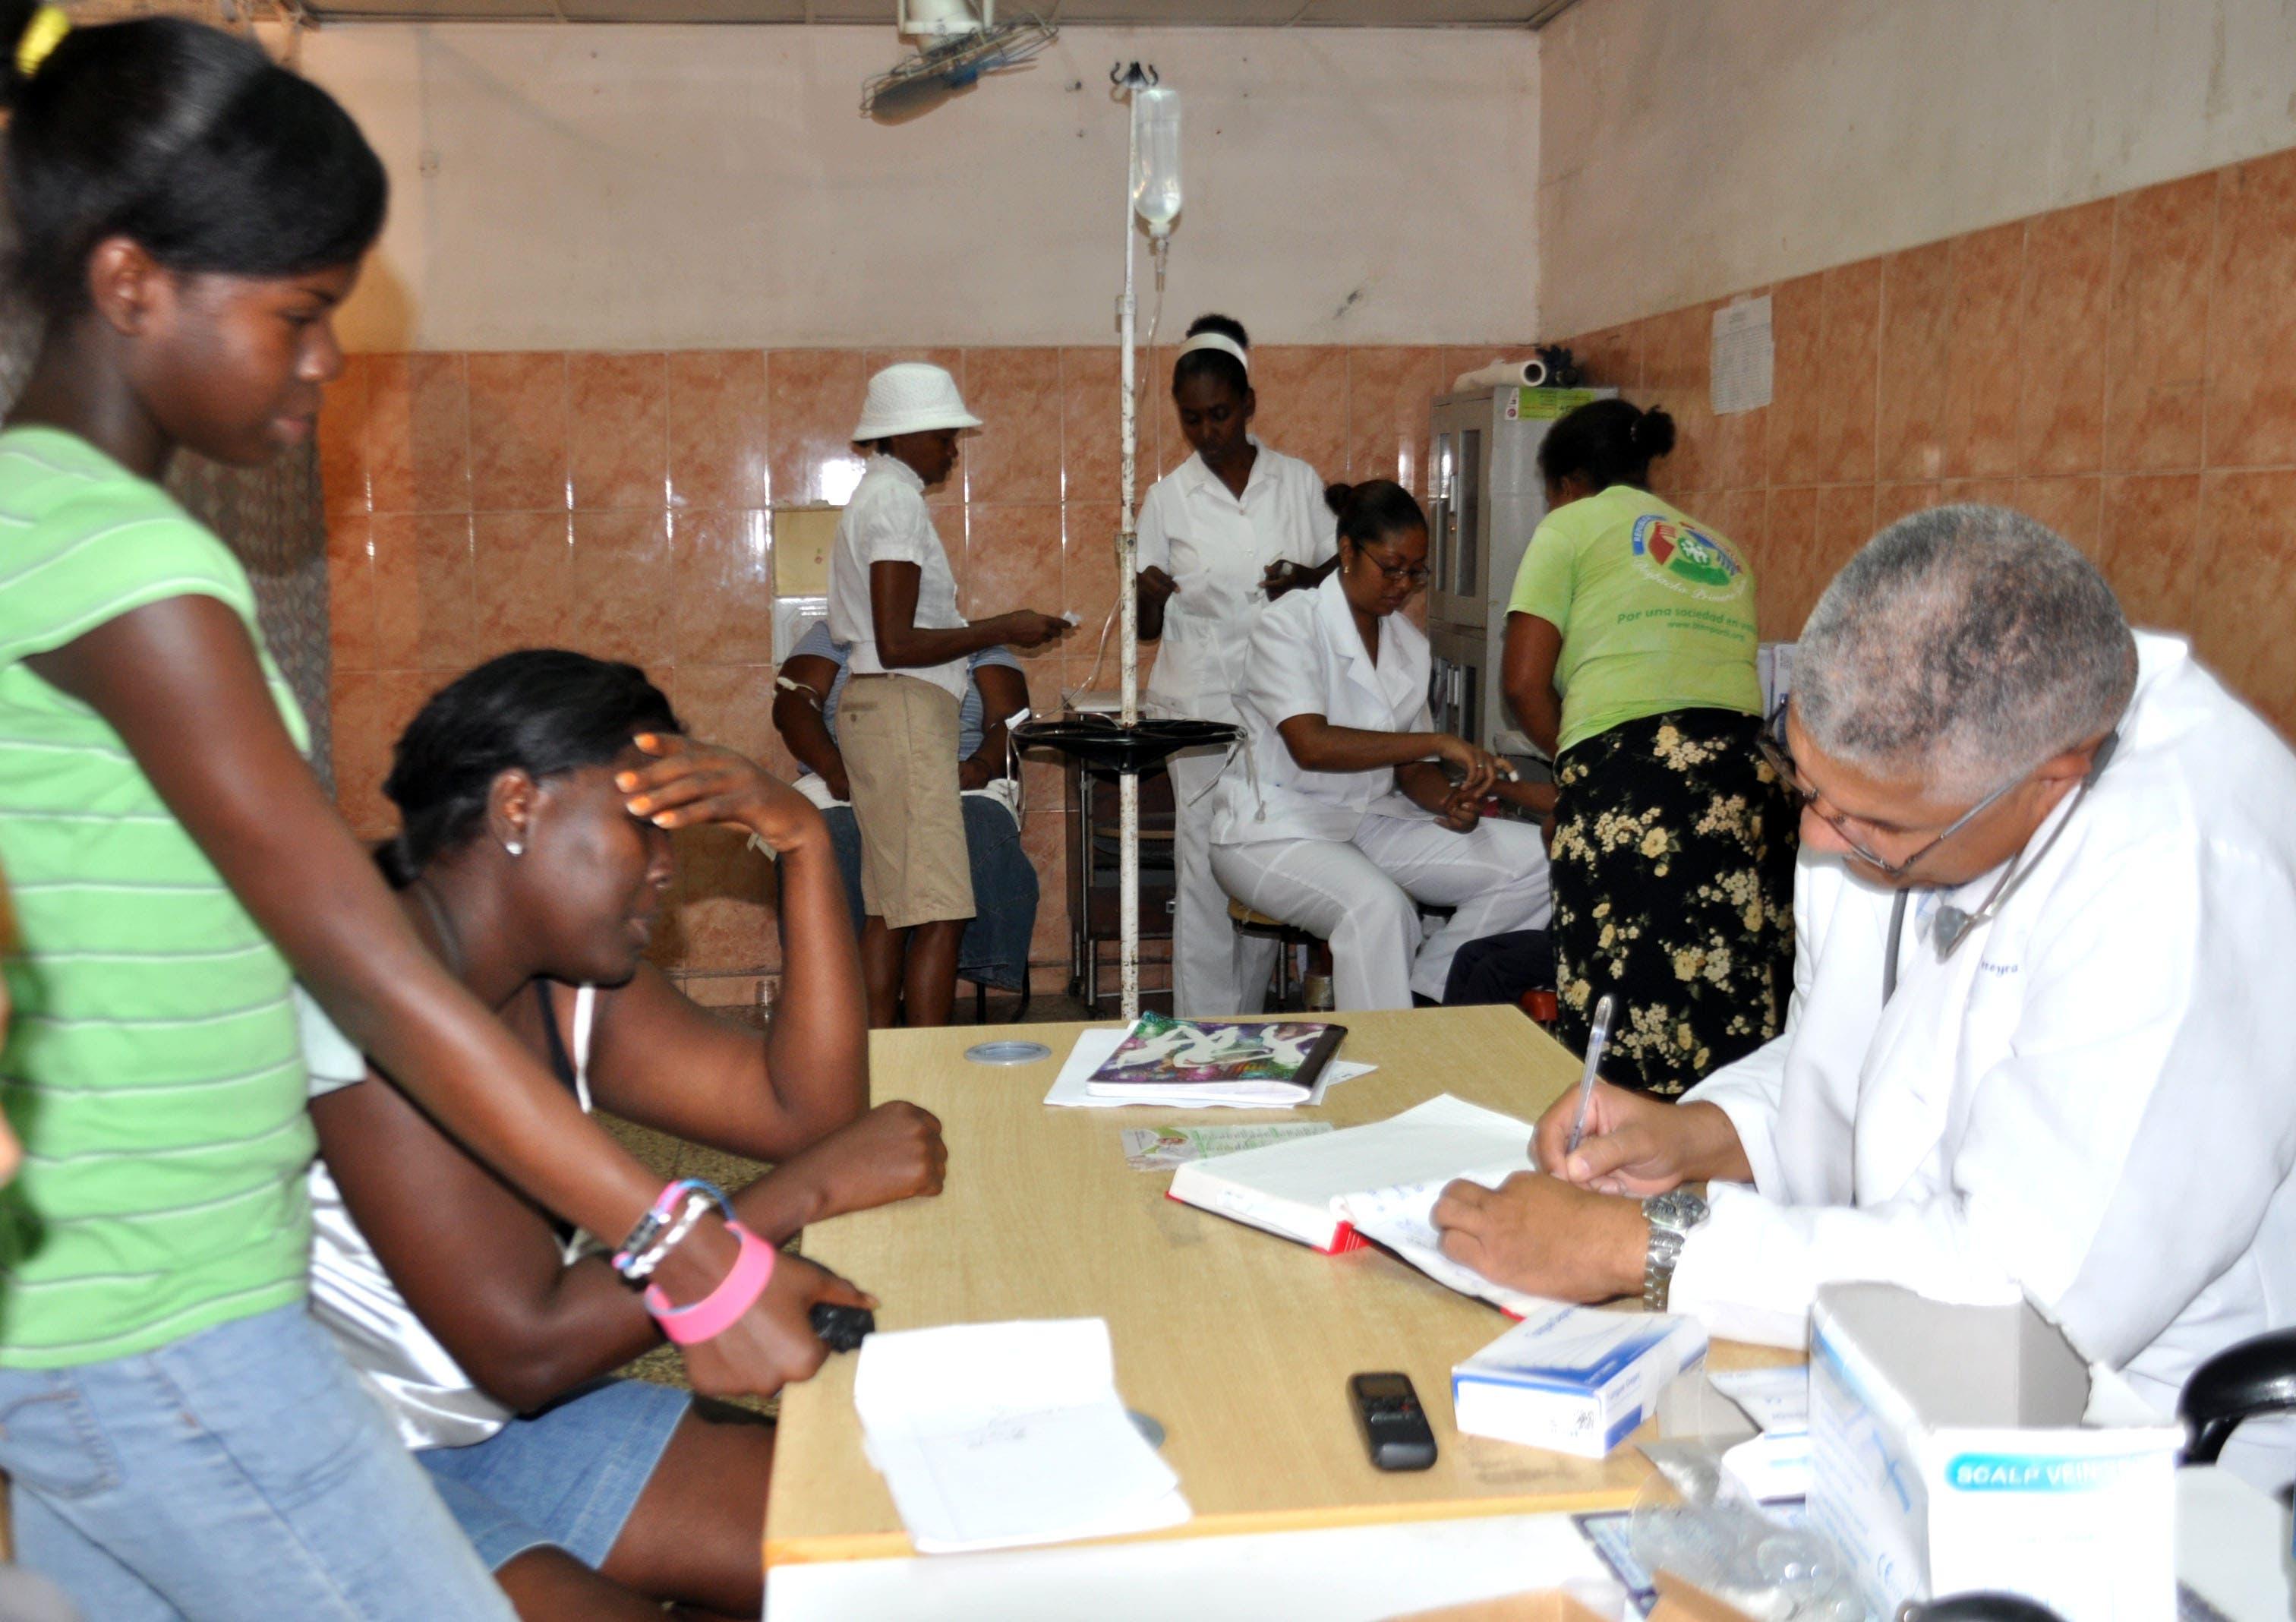 Pacientes narran dolores insoportables por chikungunya; bebés gritan malestar